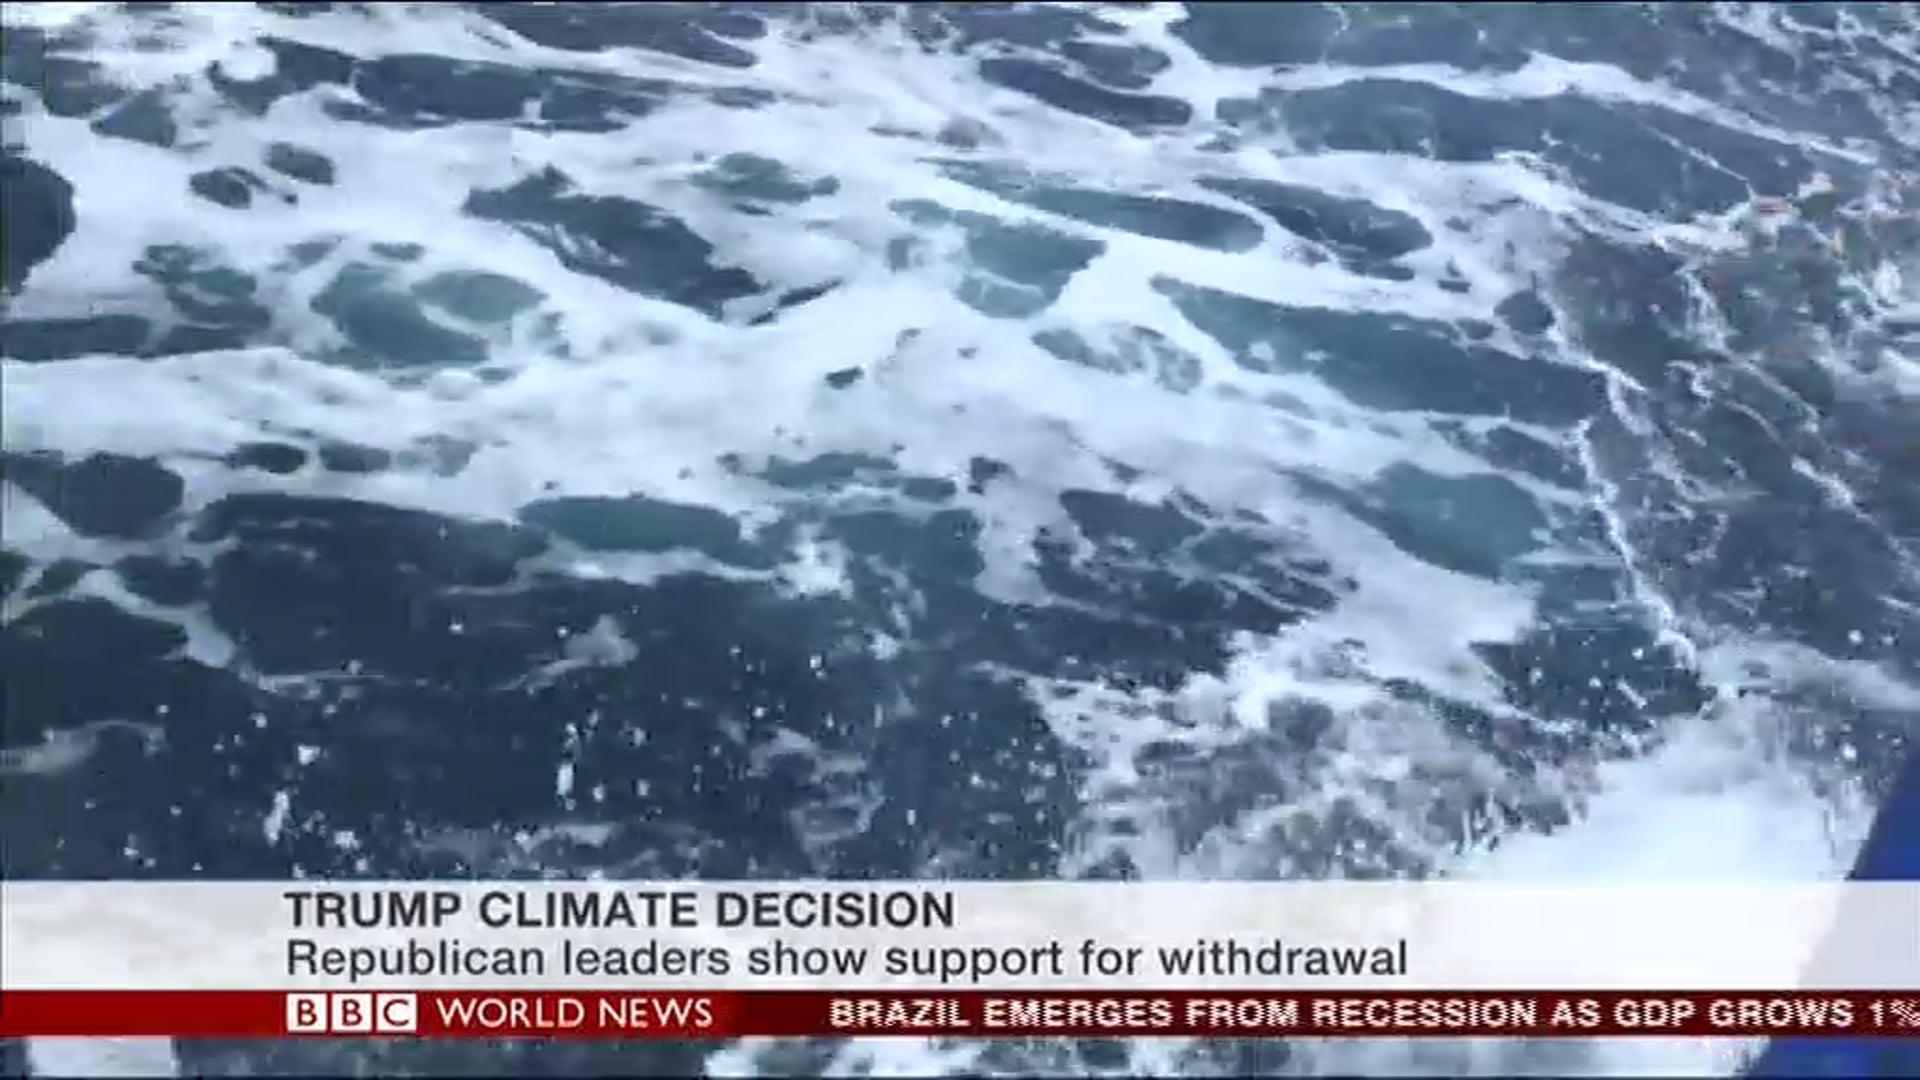 BBC_World_News-2017-06-02_08-22-39